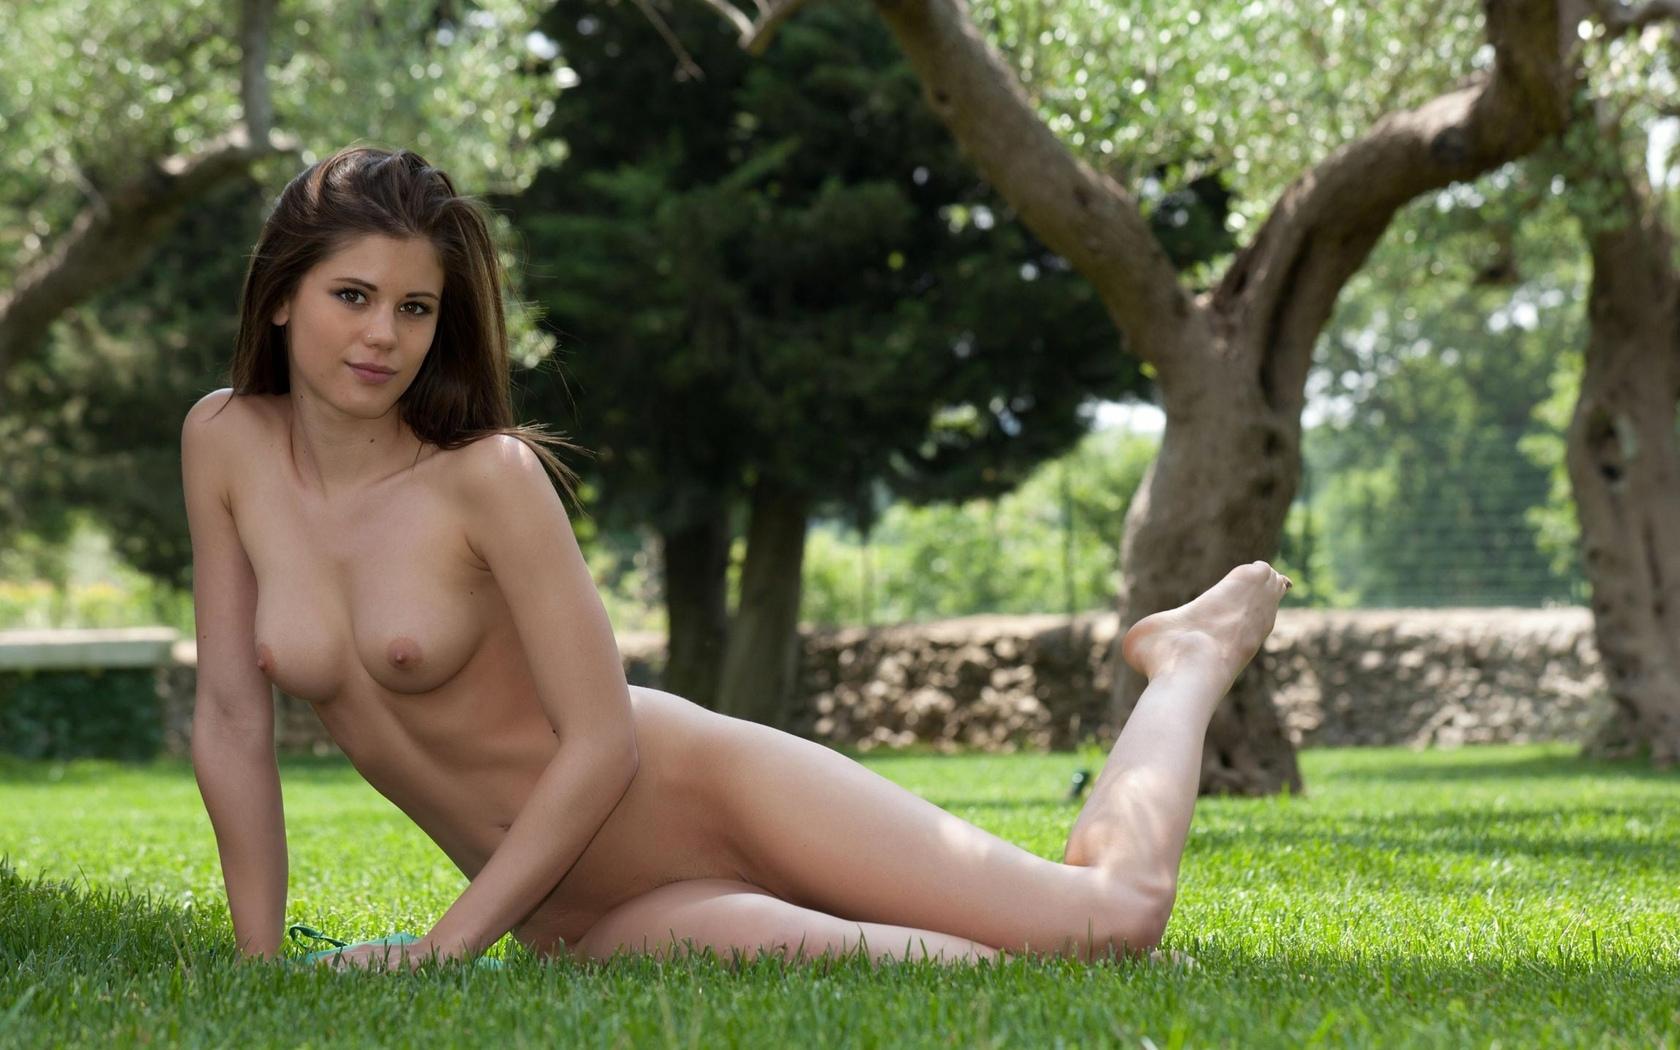 каприз, позирует, на траве, грудь, ножки